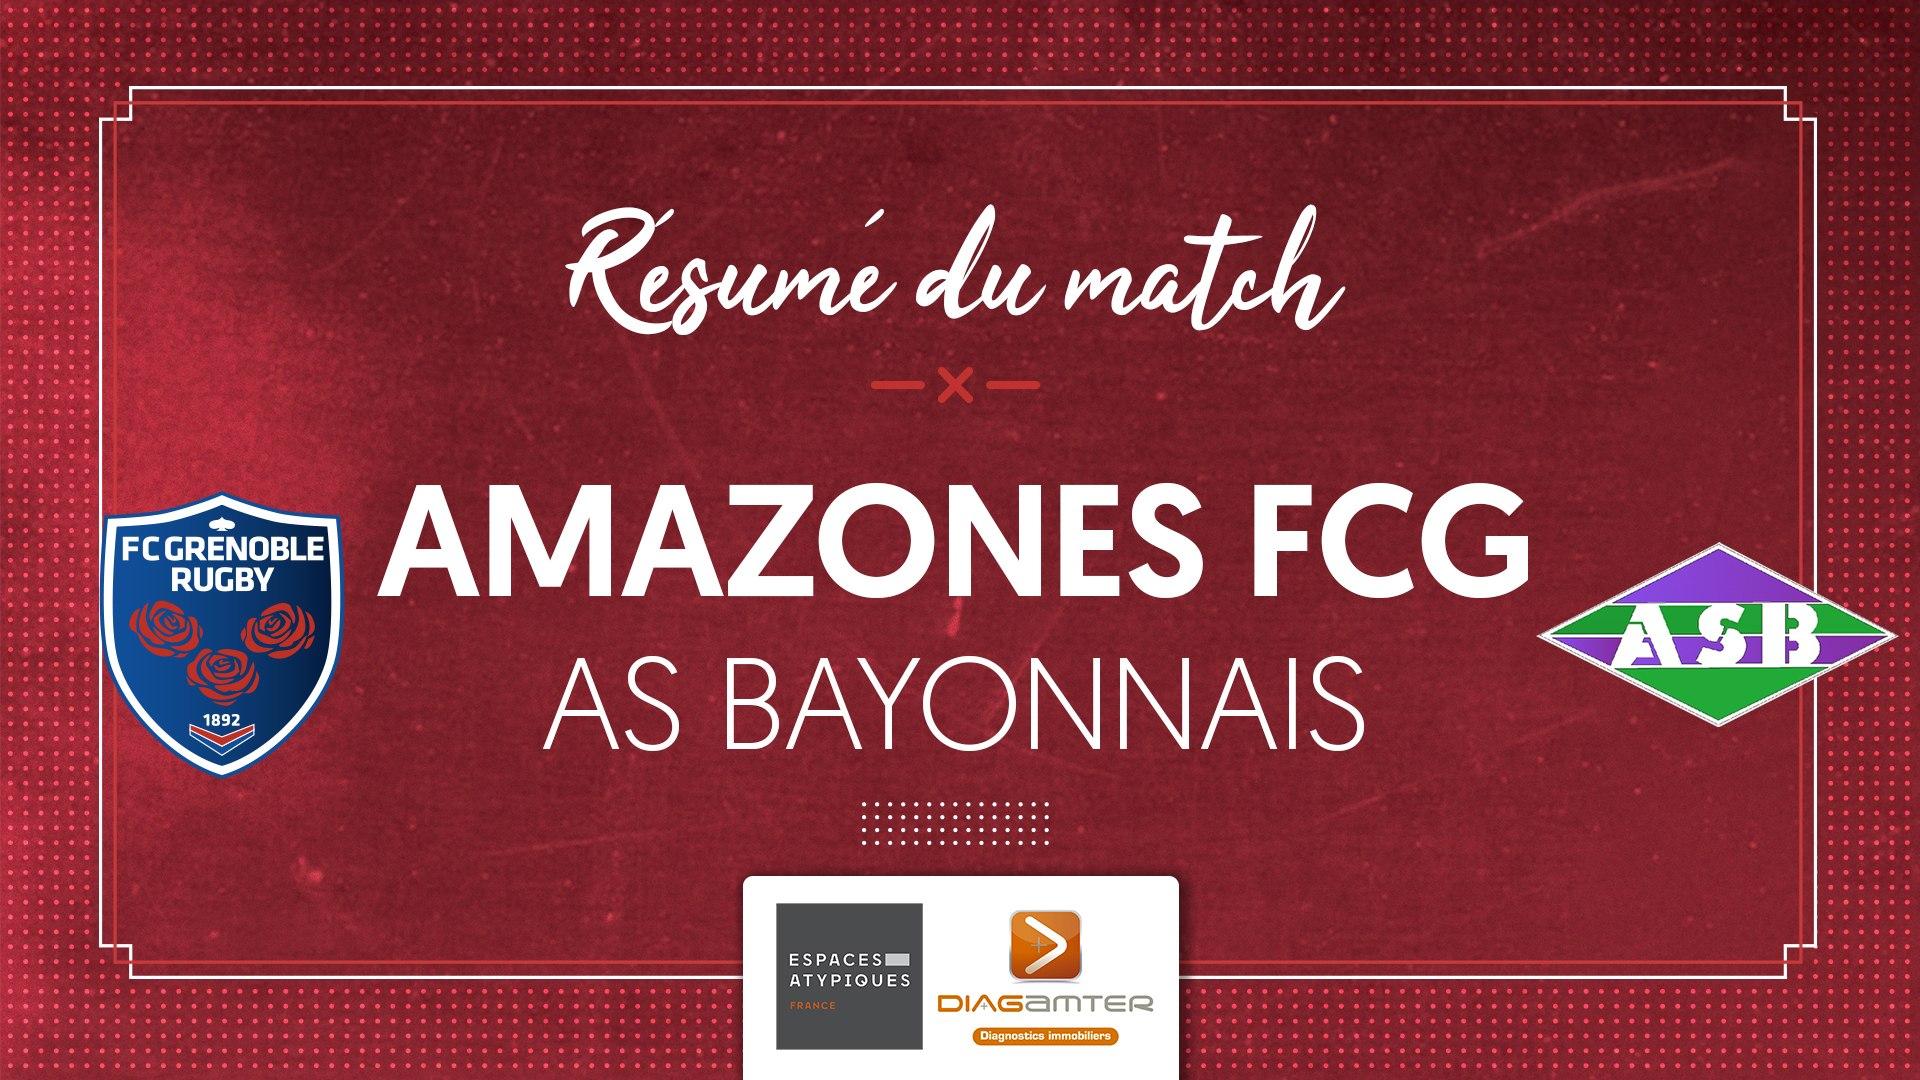 Amazones - AS Bayonnais : le résumé vidéo